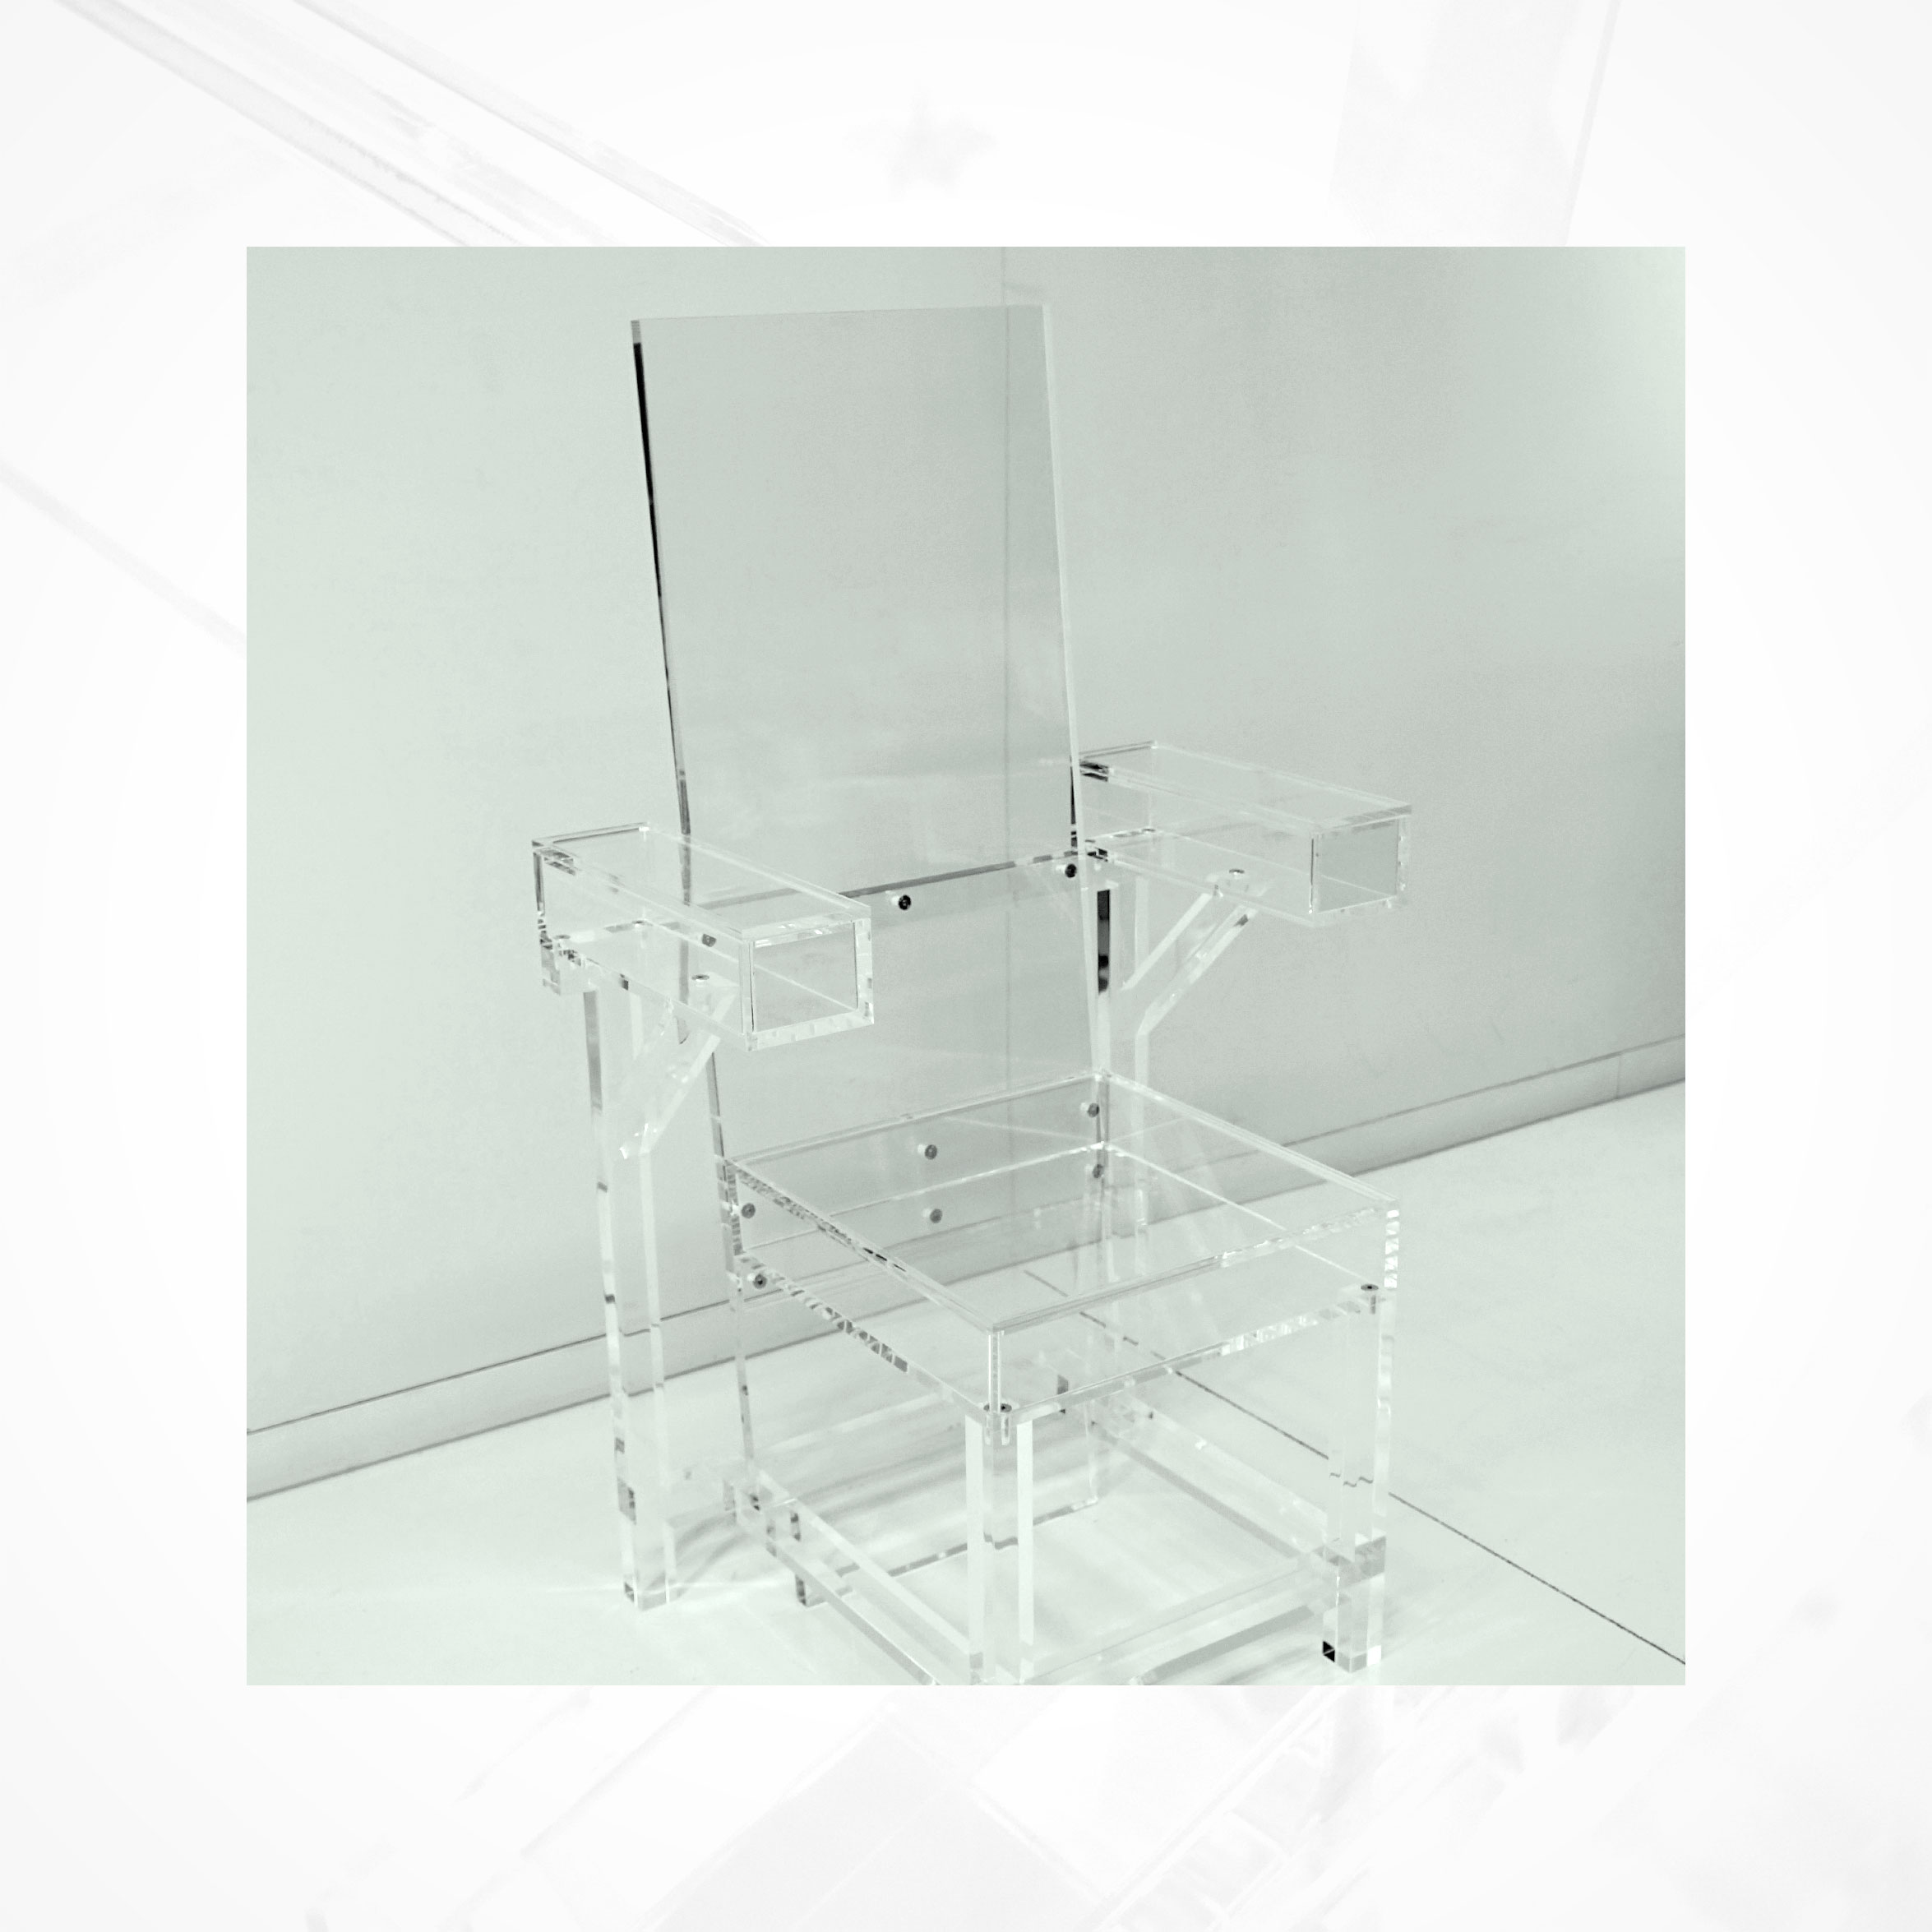 03-TransparentColorful-07b